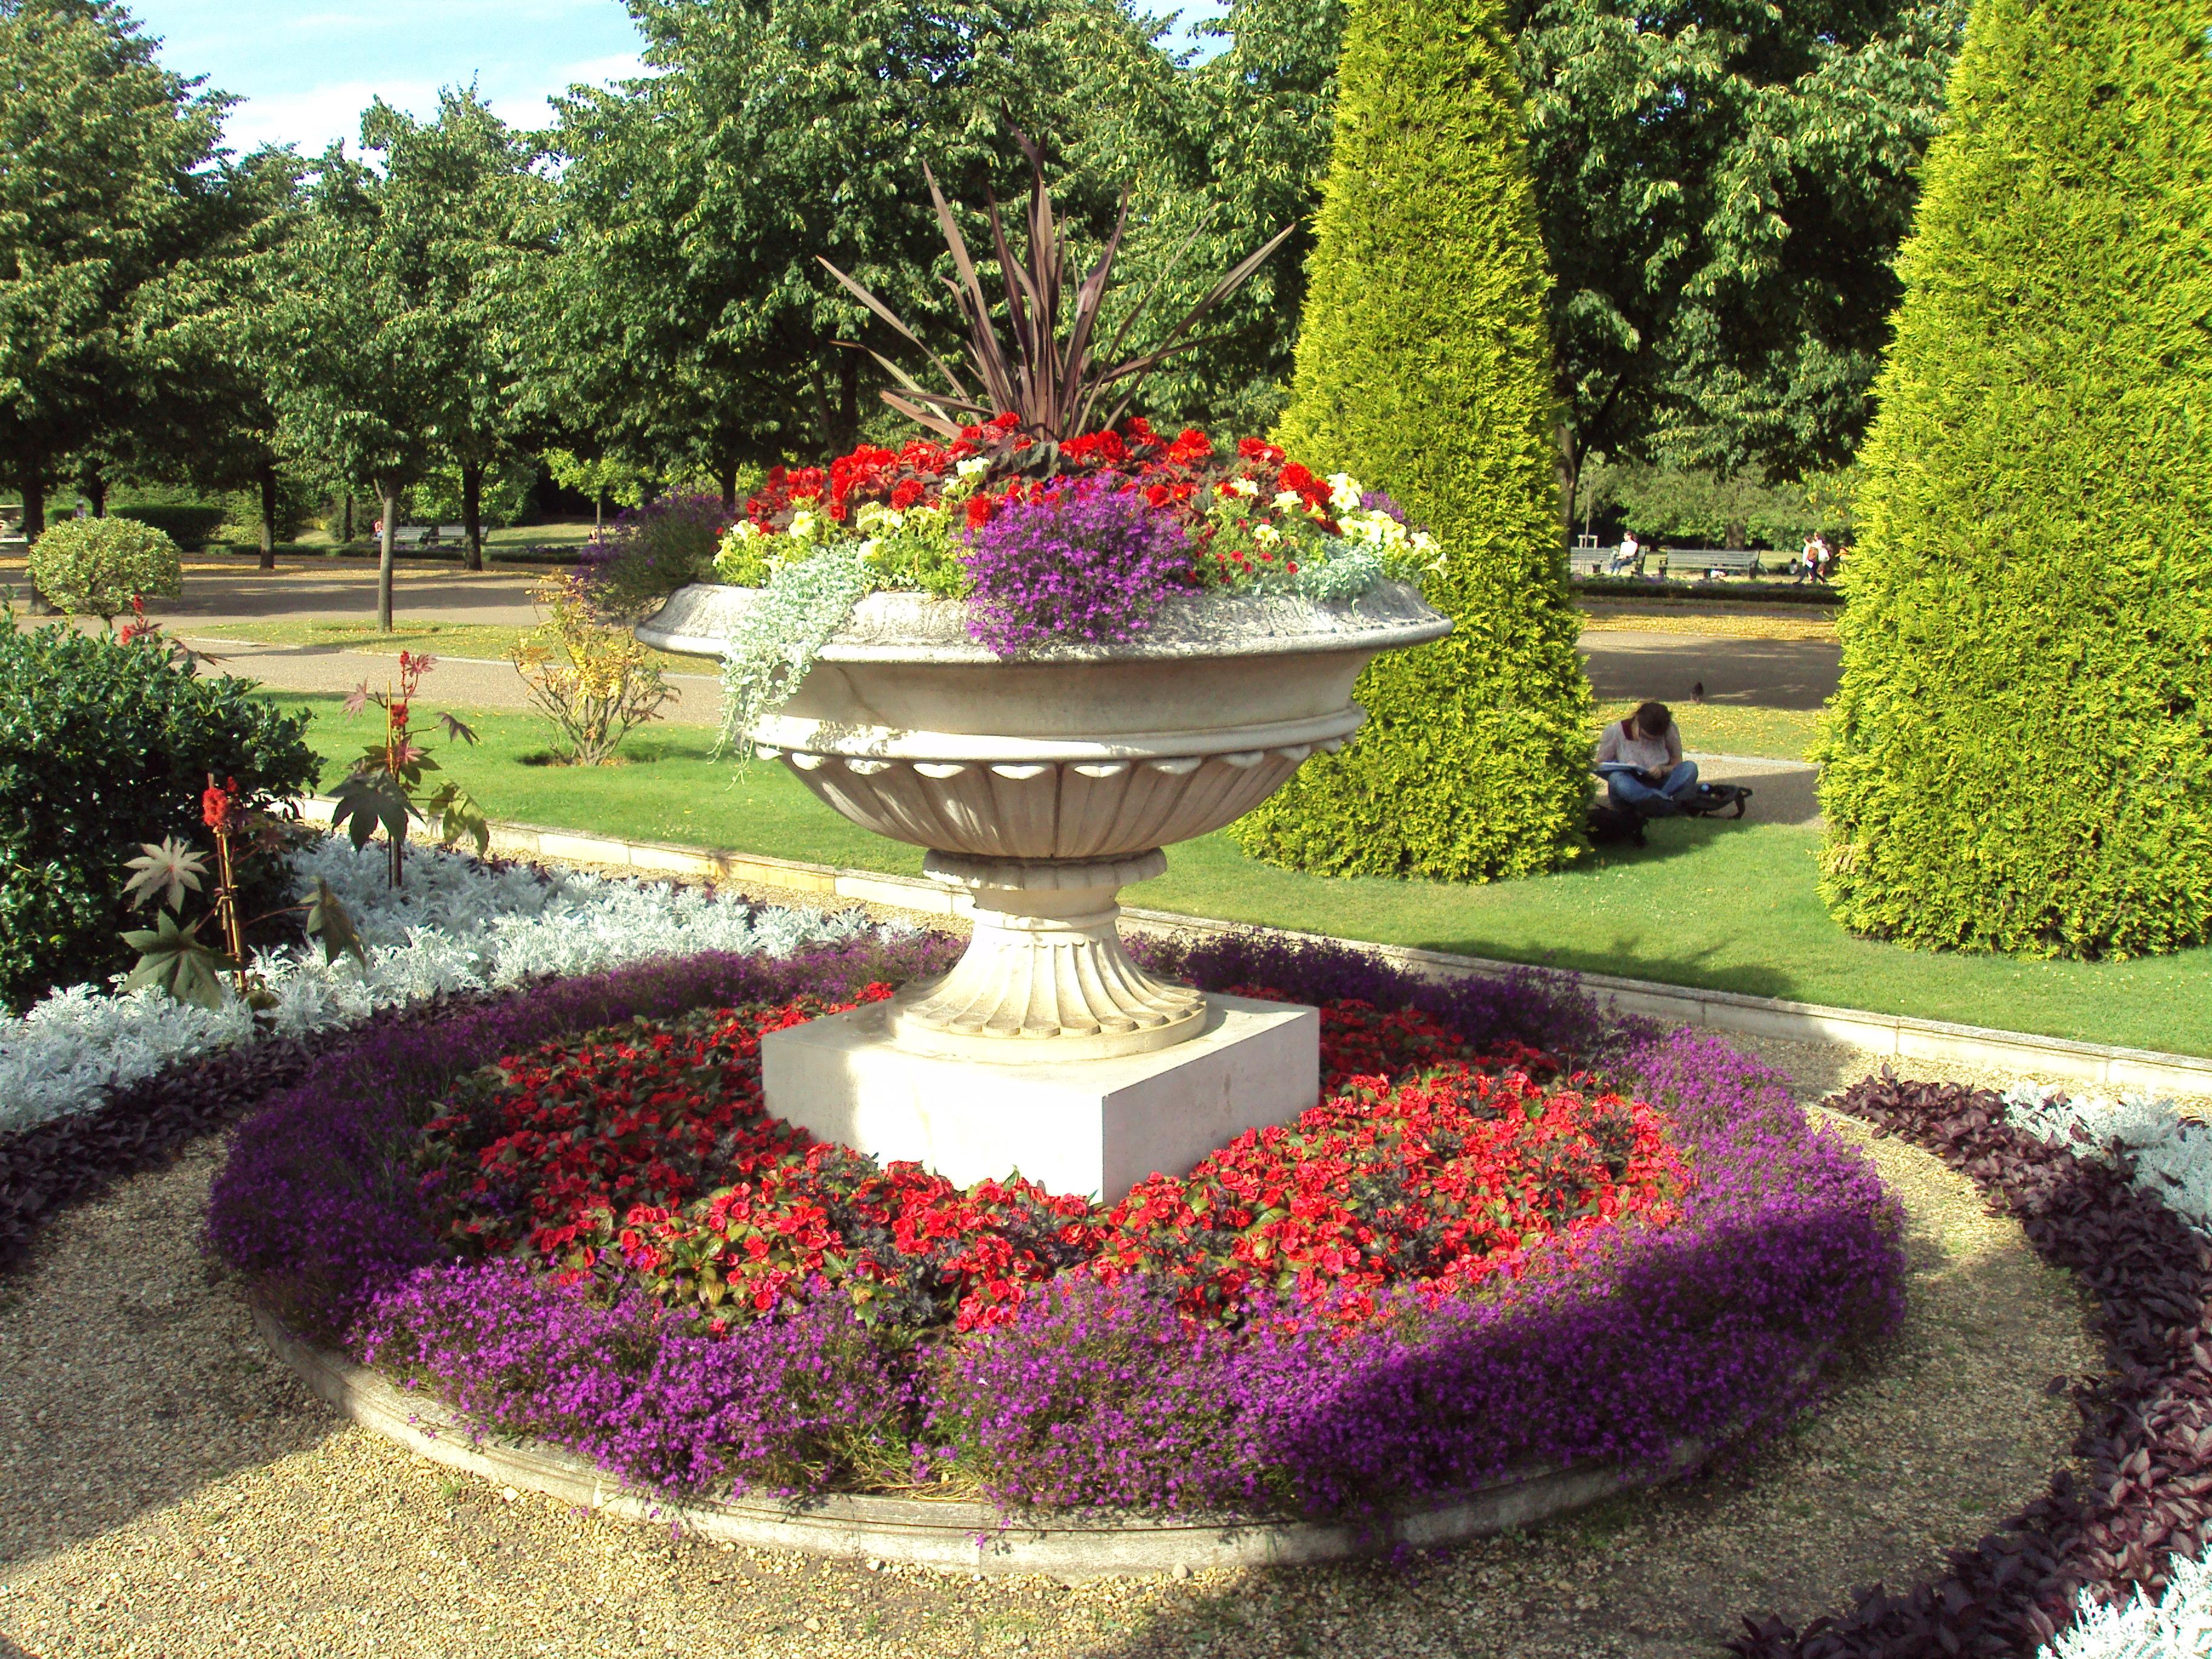 file flowers regent 39 s park london dsc07048 jpg wikimedia commons. Black Bedroom Furniture Sets. Home Design Ideas